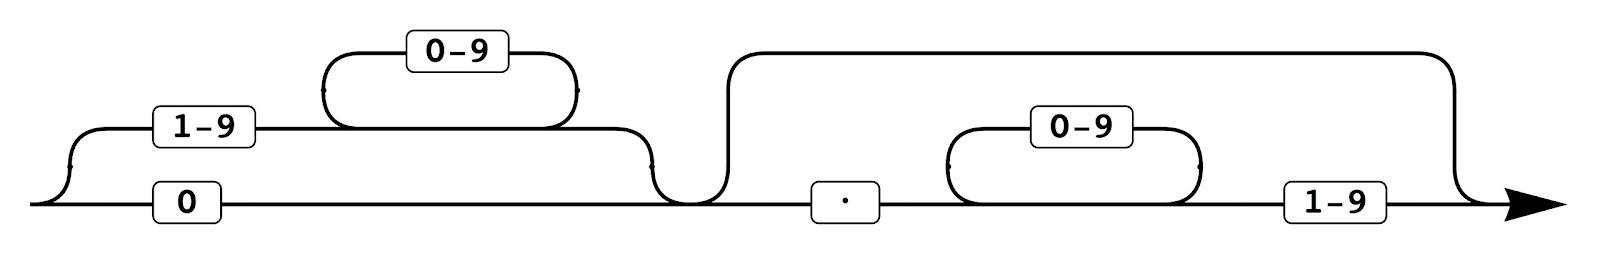 ismp-rails.jpg